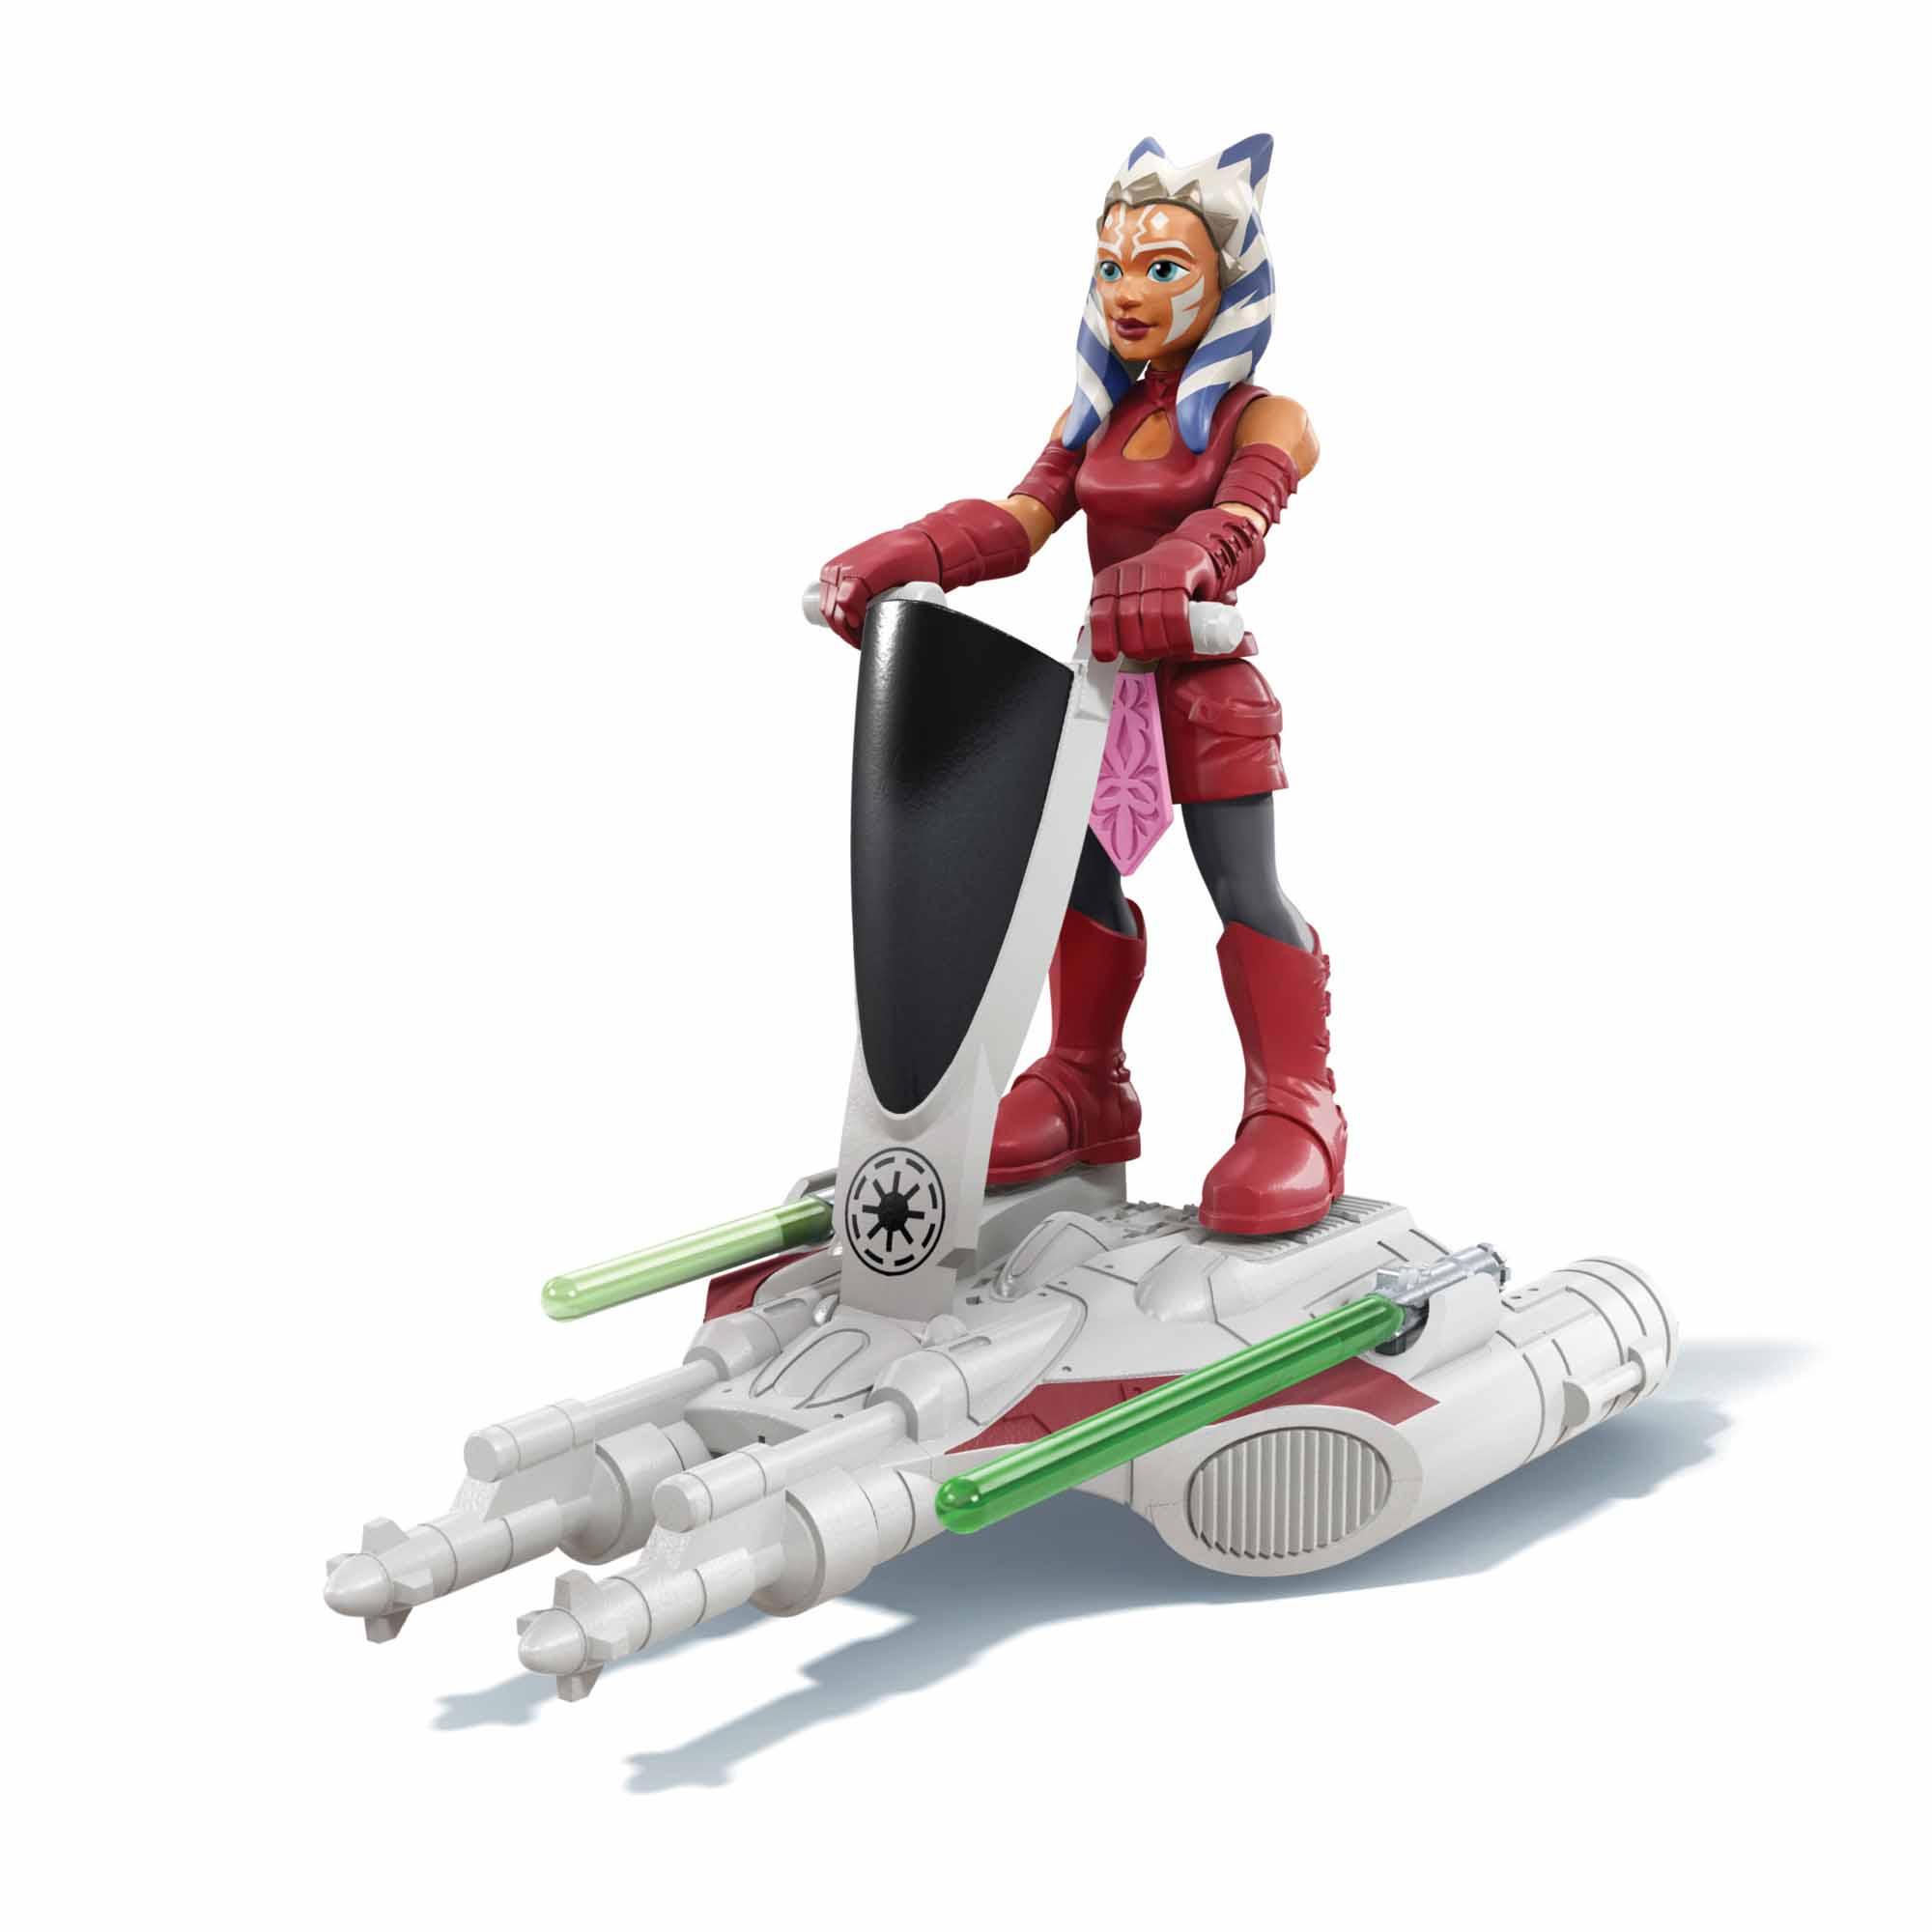 Star Wars Mission Fleet -Véhicule d' Ahsoka Tano Aquatic Attack